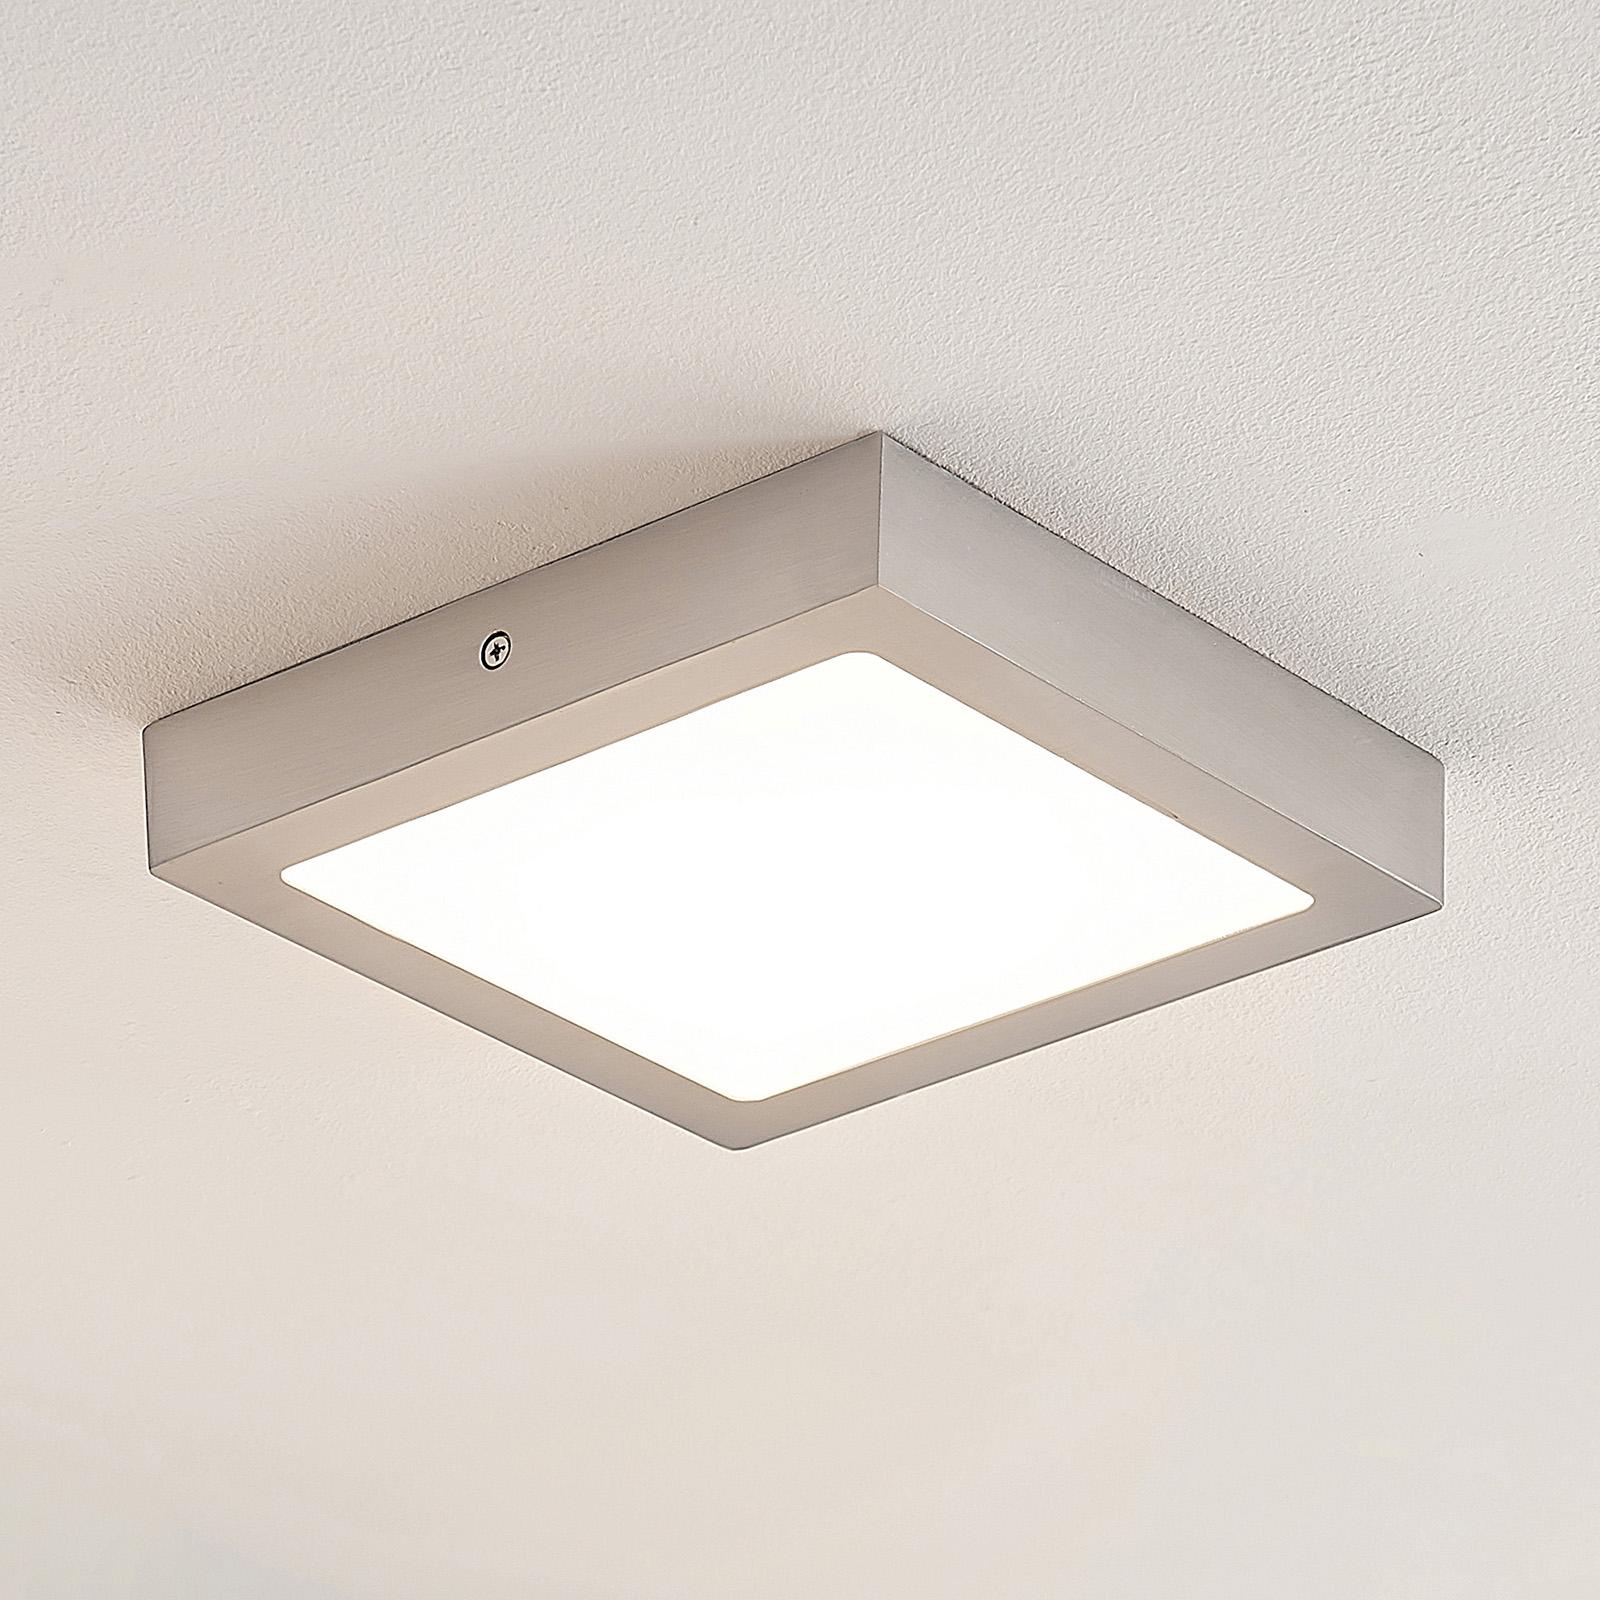 ELC Merina LED-kattovalaisin nikkeli 21,5x21,5 cm